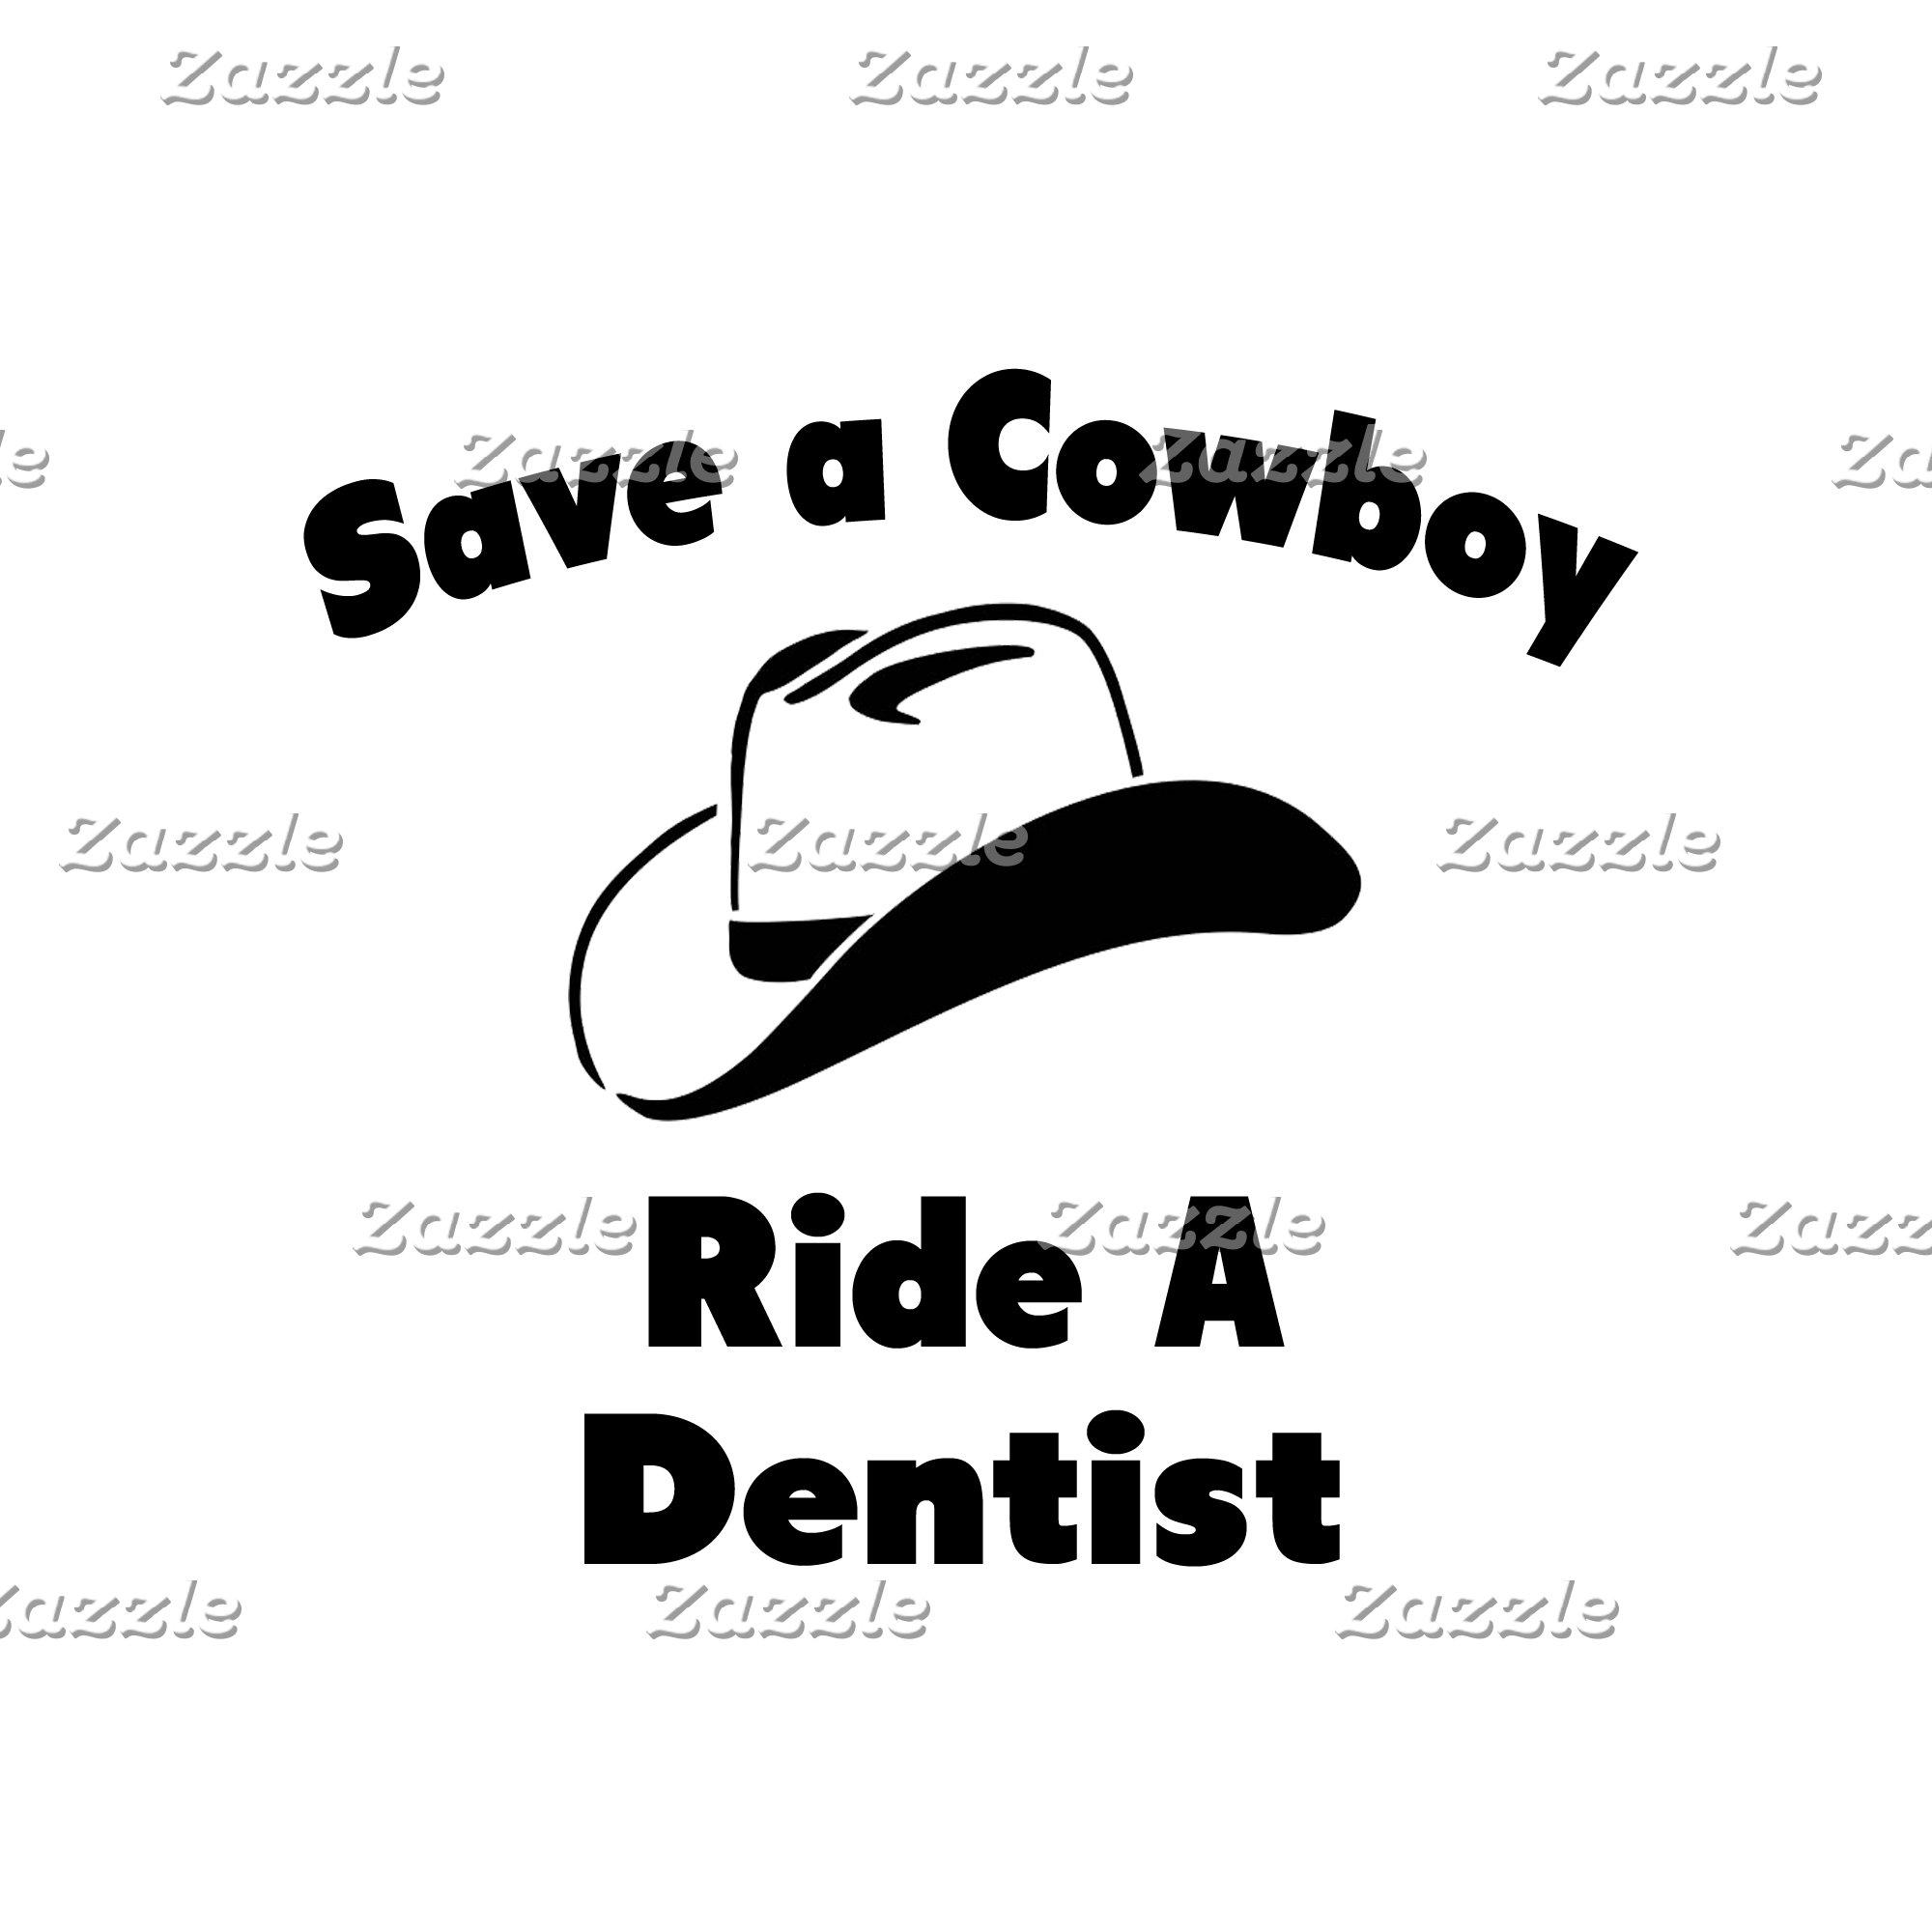 Save a Cowboy .. Ride a Dentist